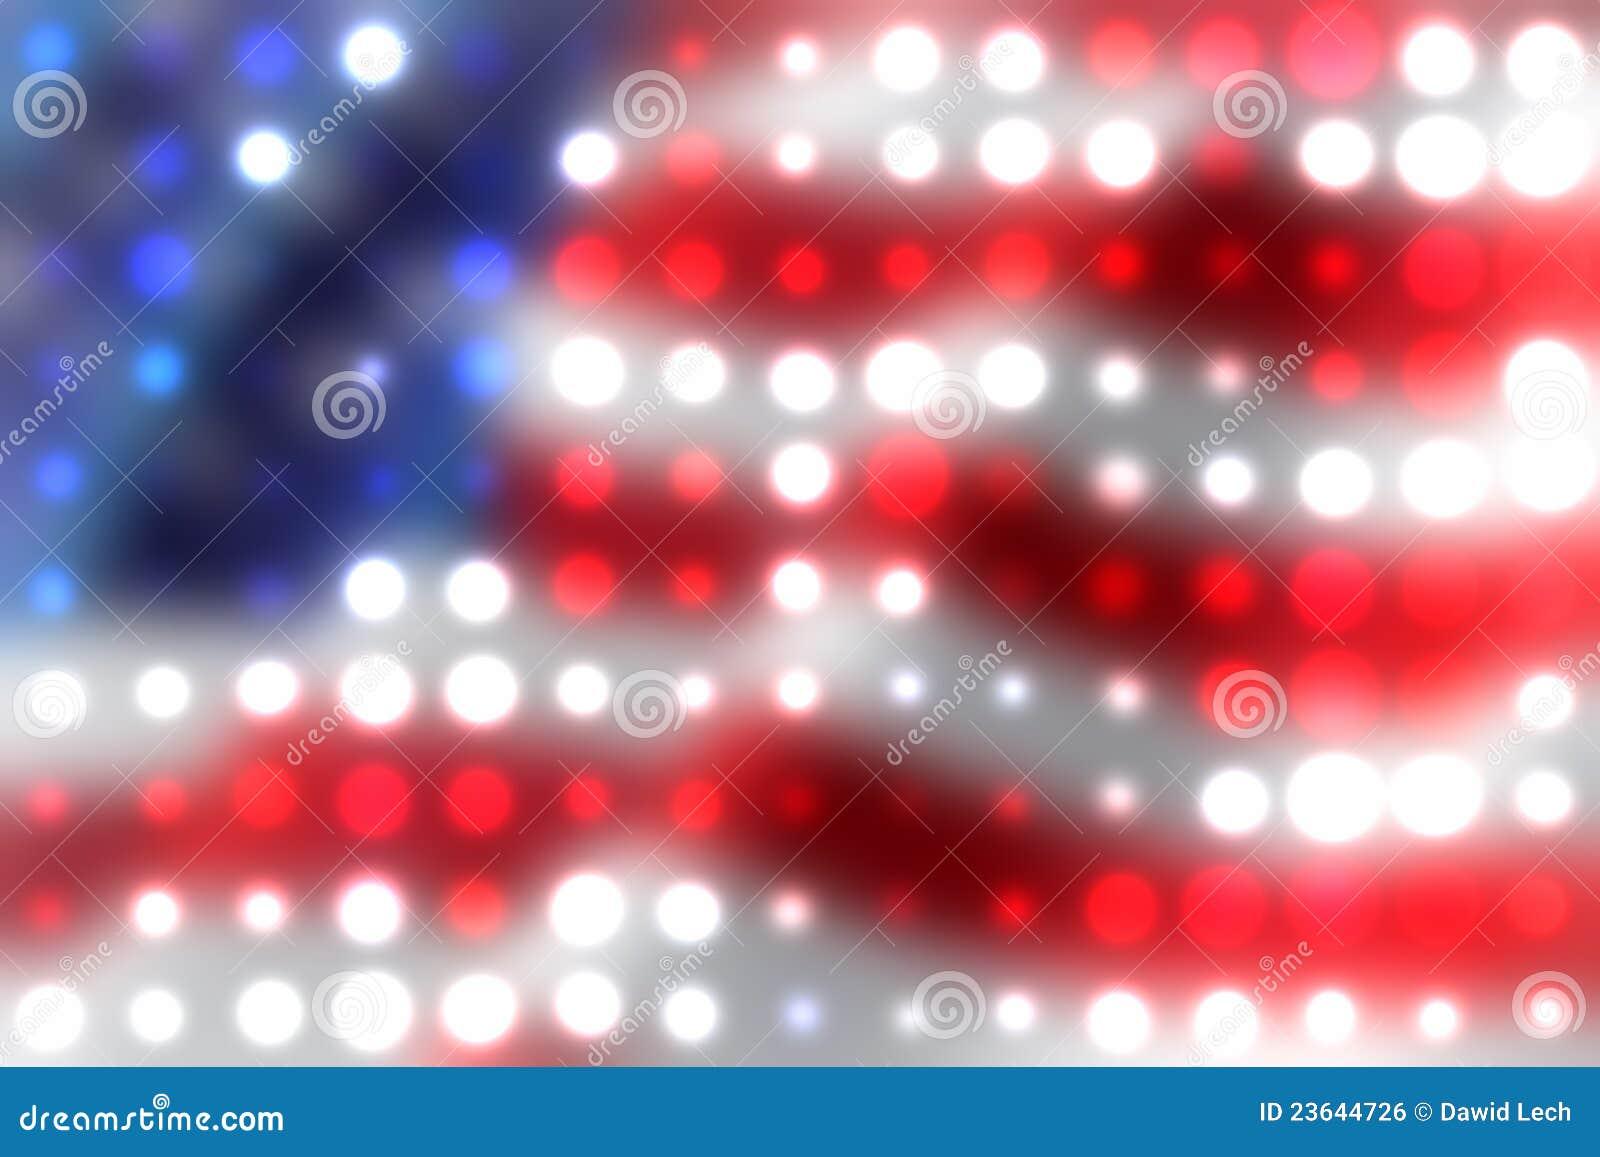 American flag light spots background